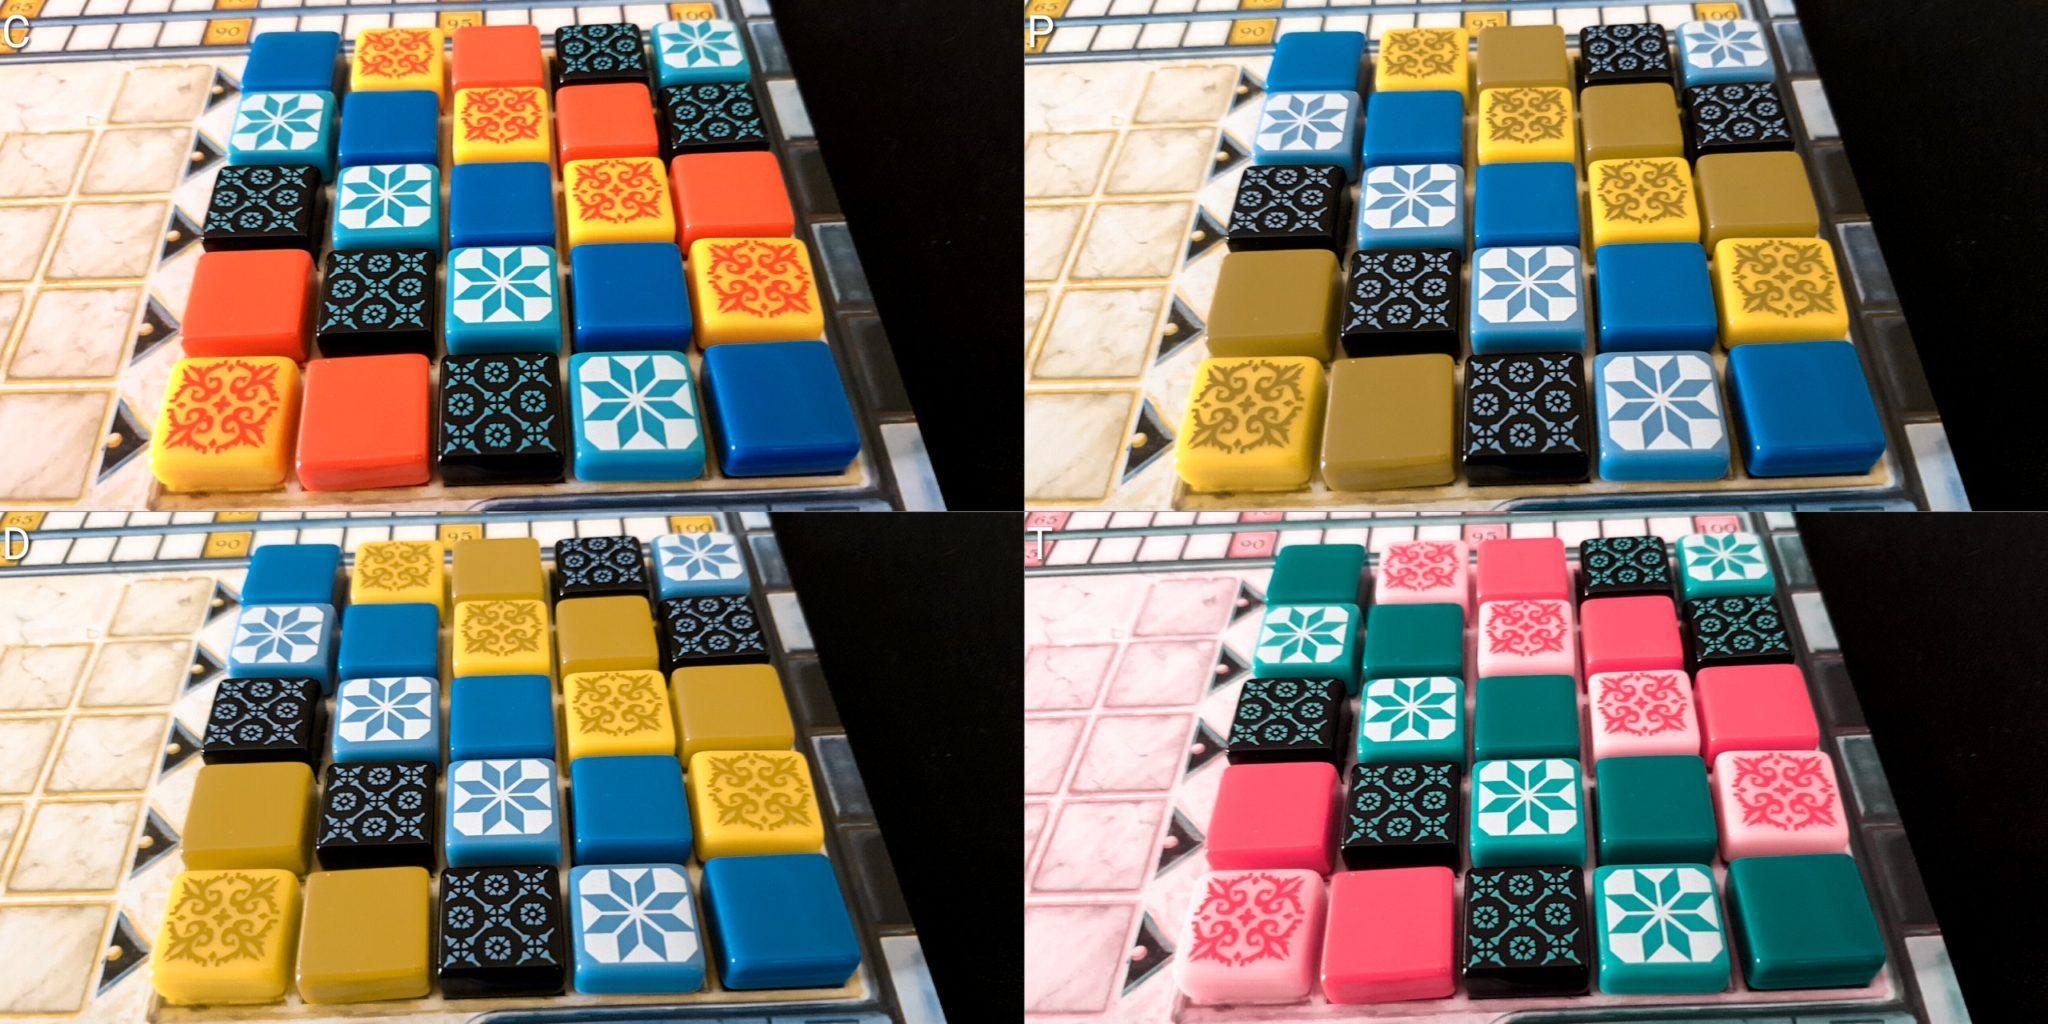 Colour blindness tiles